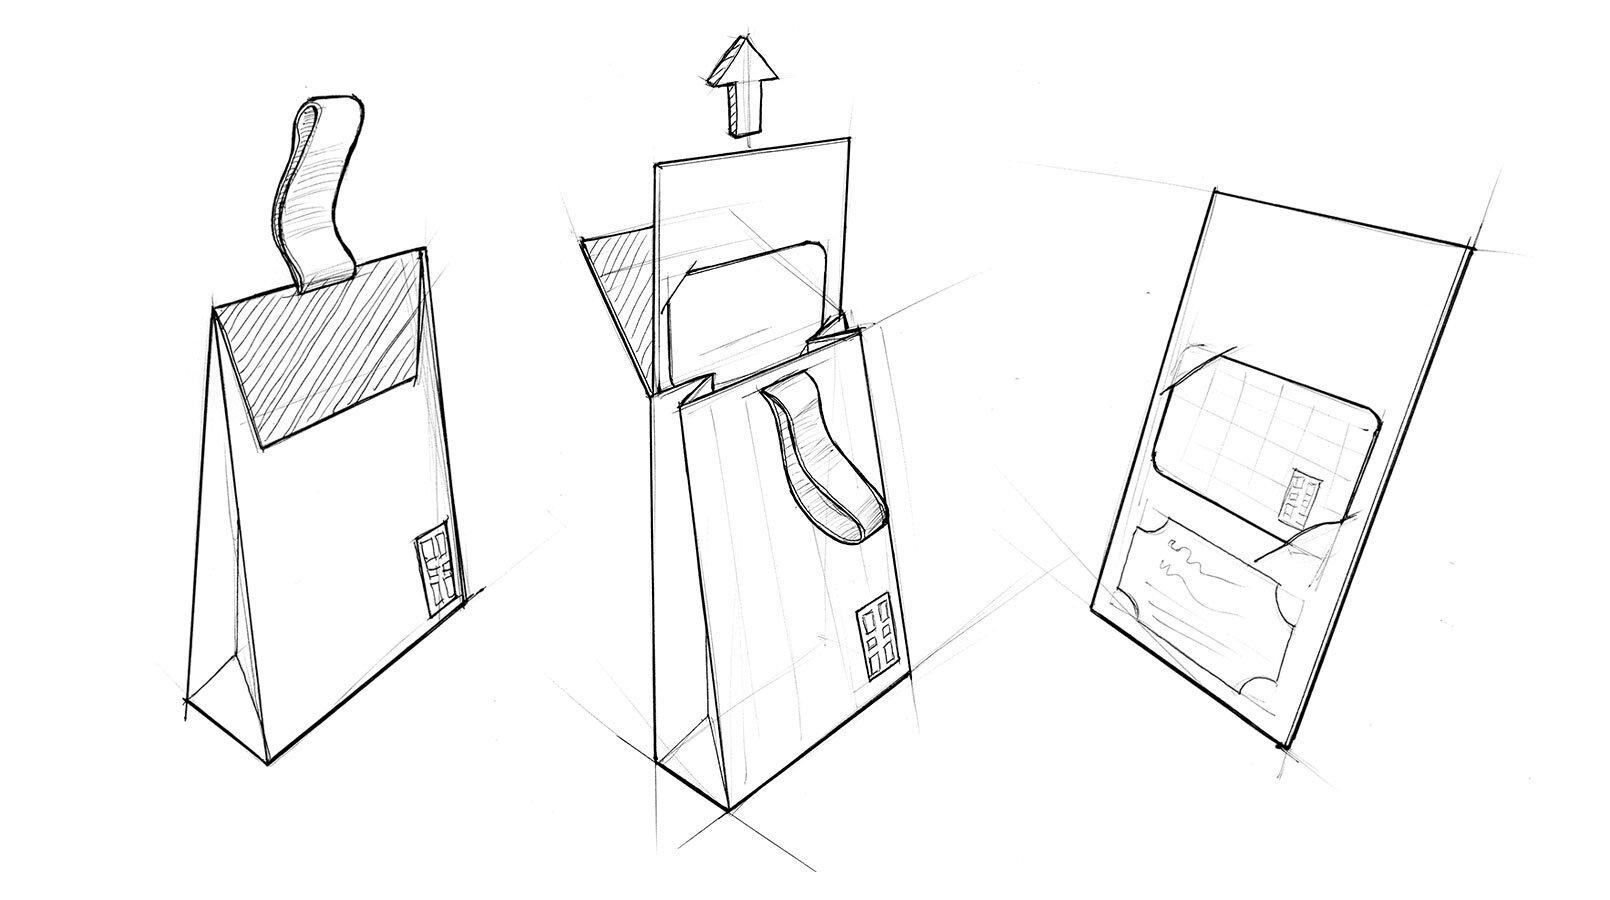 Elizabeth-Arden-Red-Door-Spa-Gift-Card-Packaging-Company-Design-1.JPG